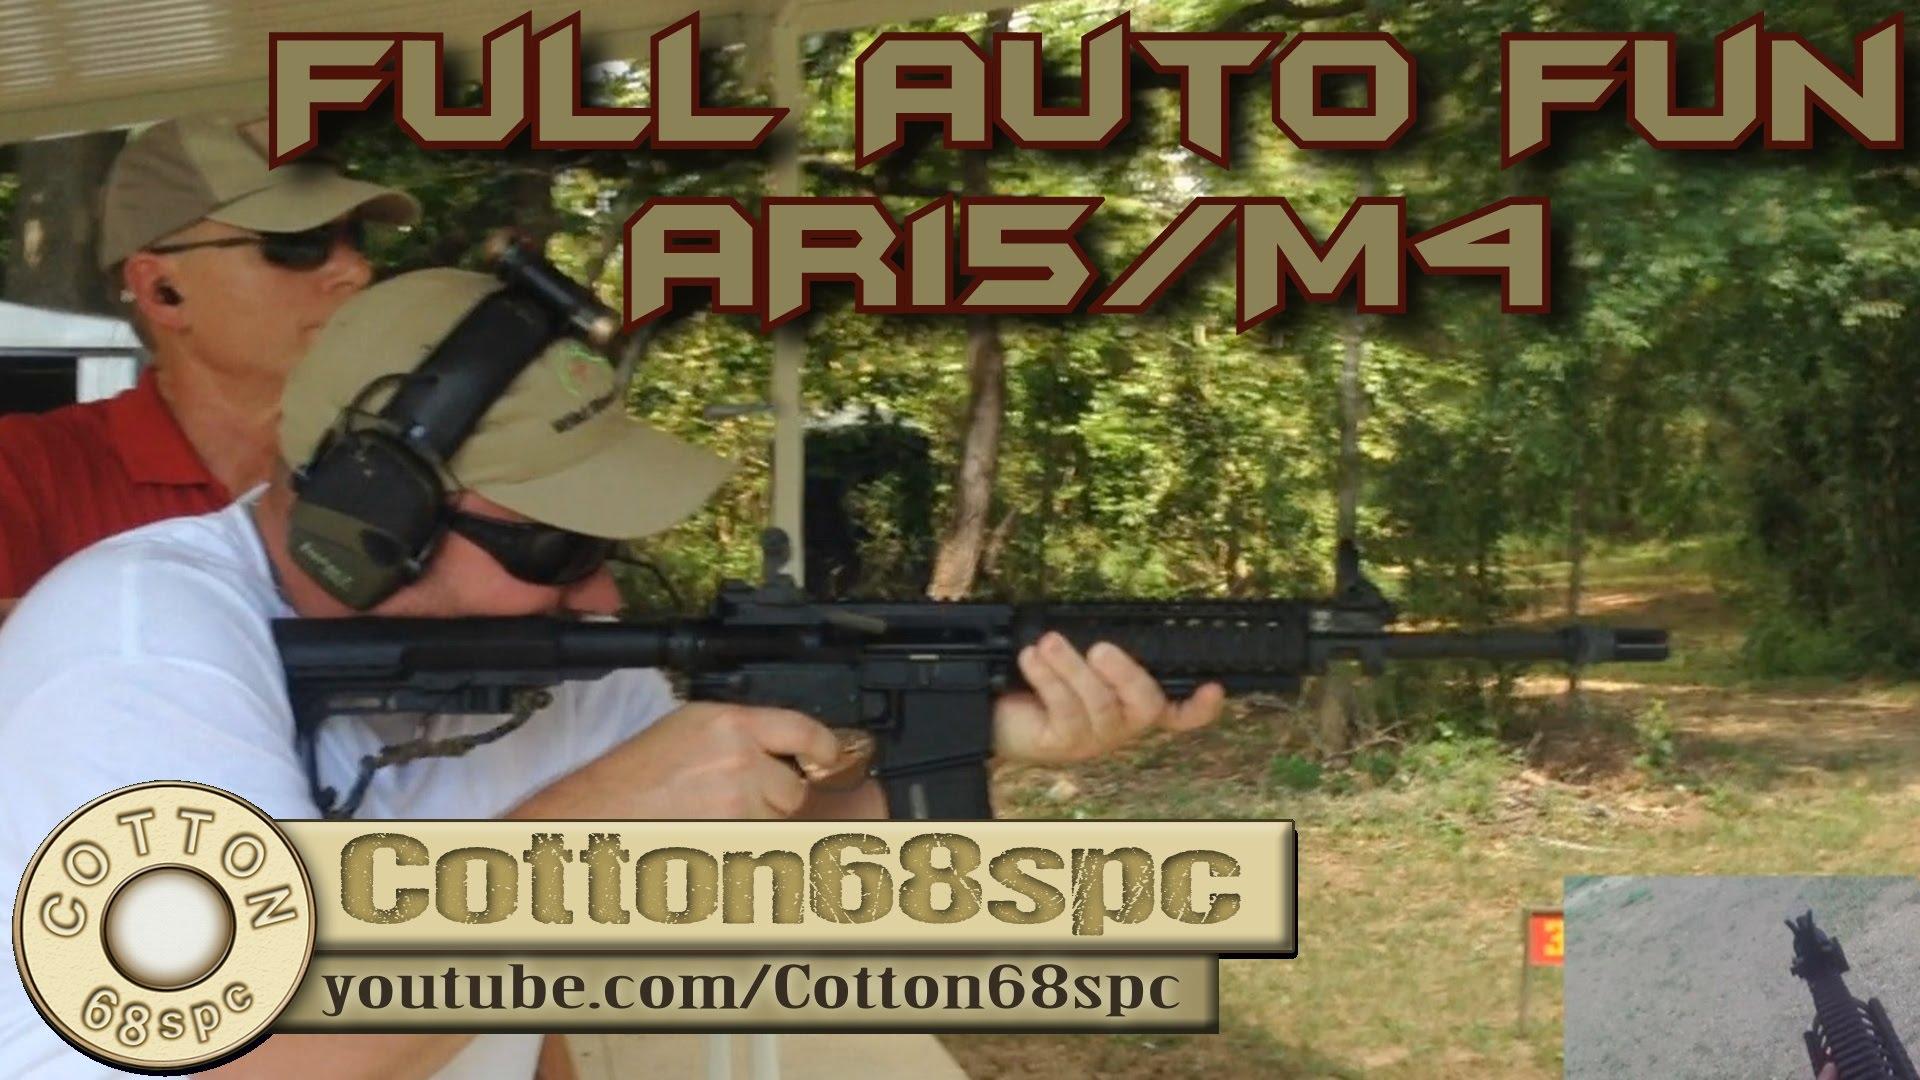 Full Auto AR-15